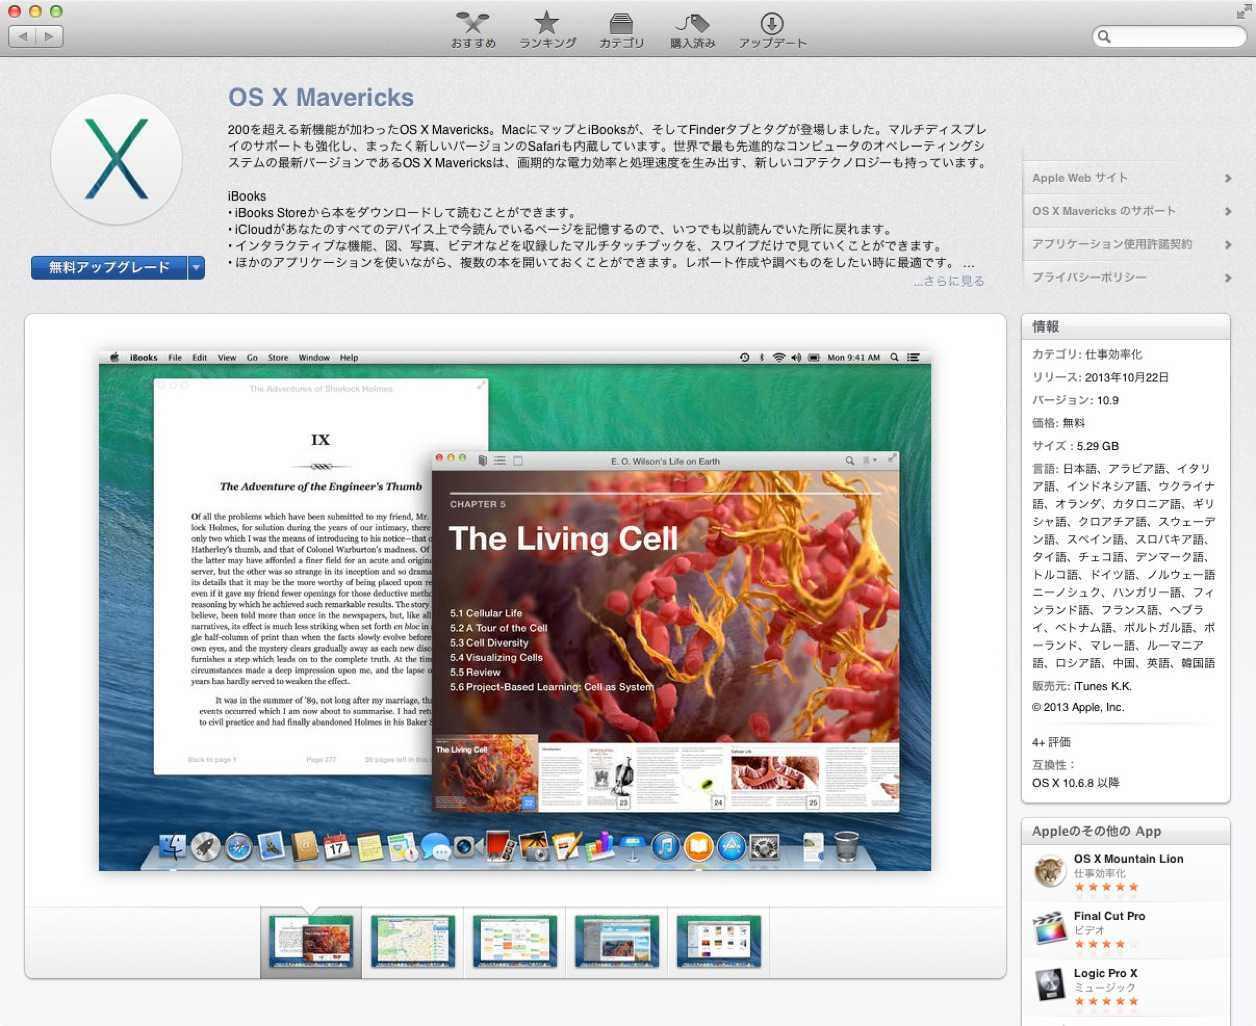 Mac App StoreでOS X Mavericks (マーベリックス) をアップグレードする